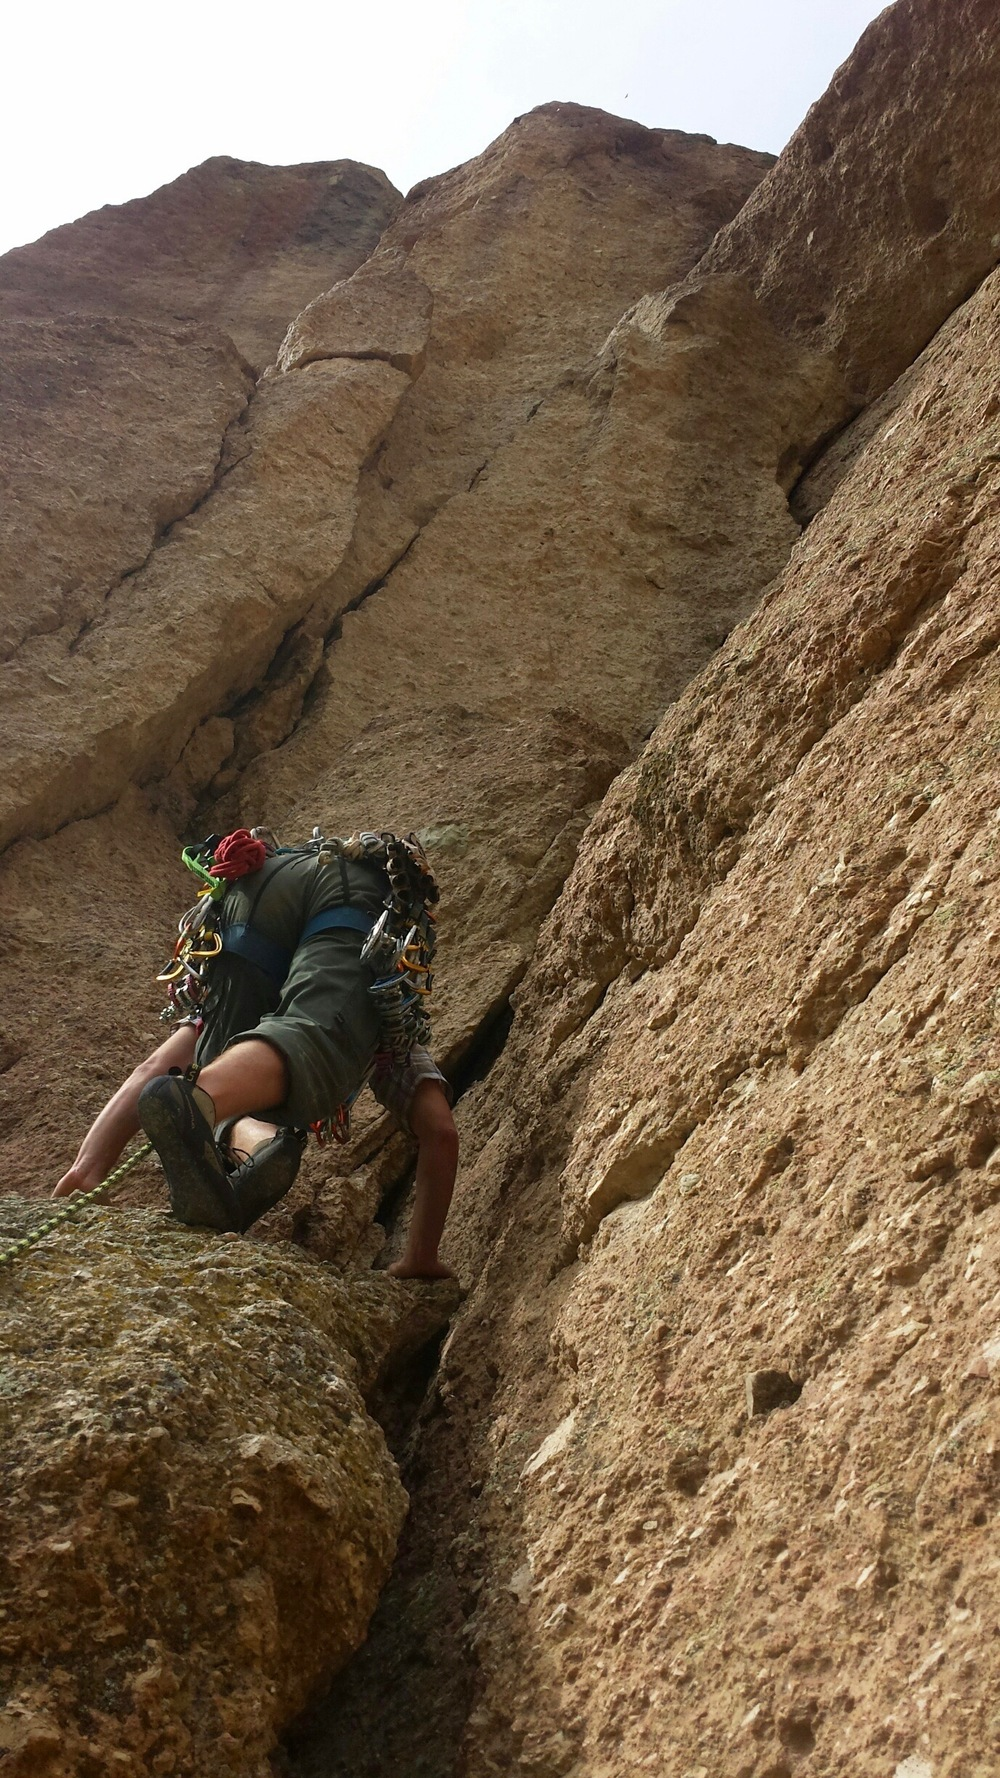 Copy of San Francisco Rock Climbing Multi-Pitch Instruction